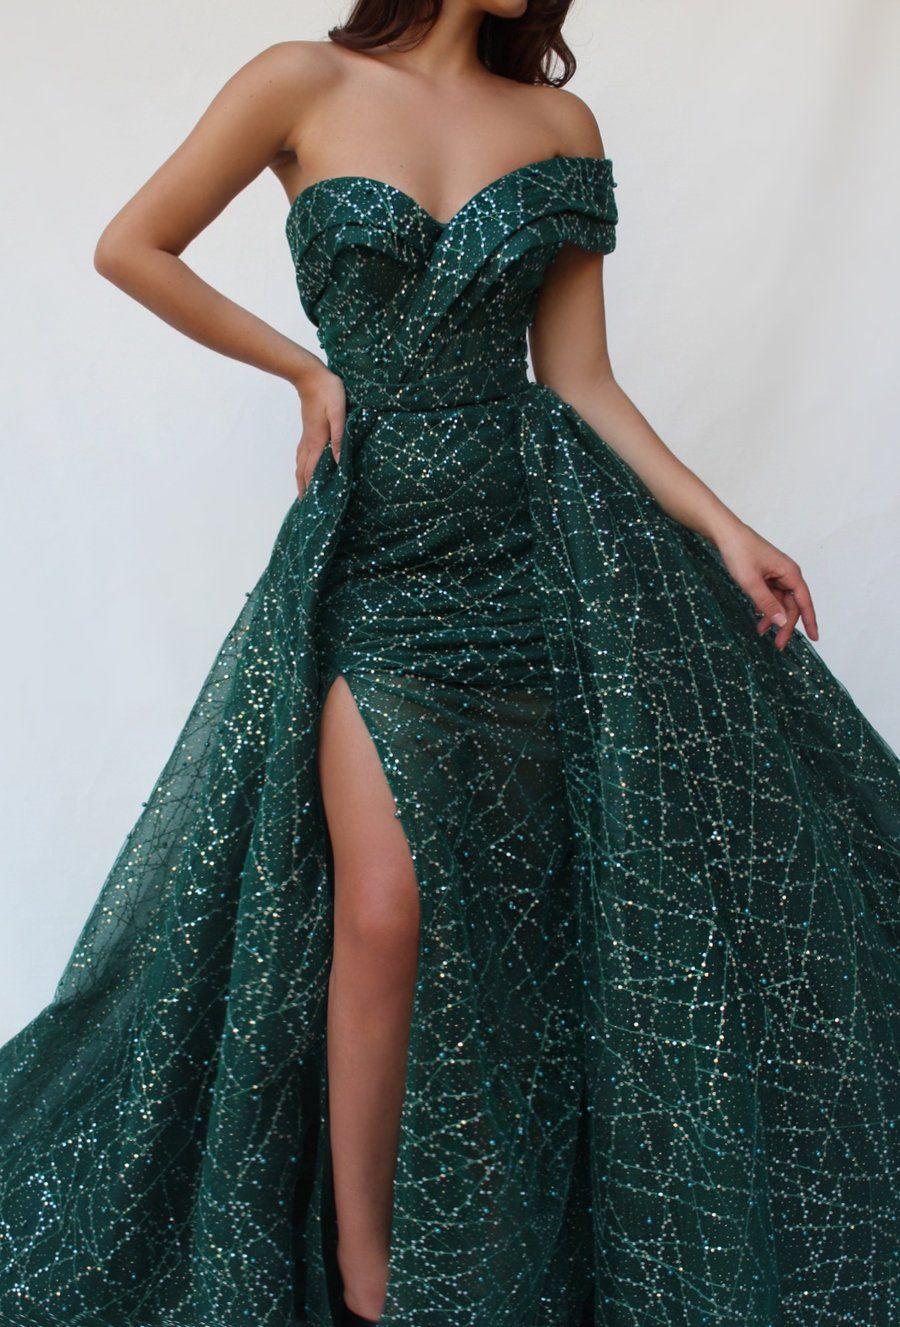 Parisan Verdant TMD Gown